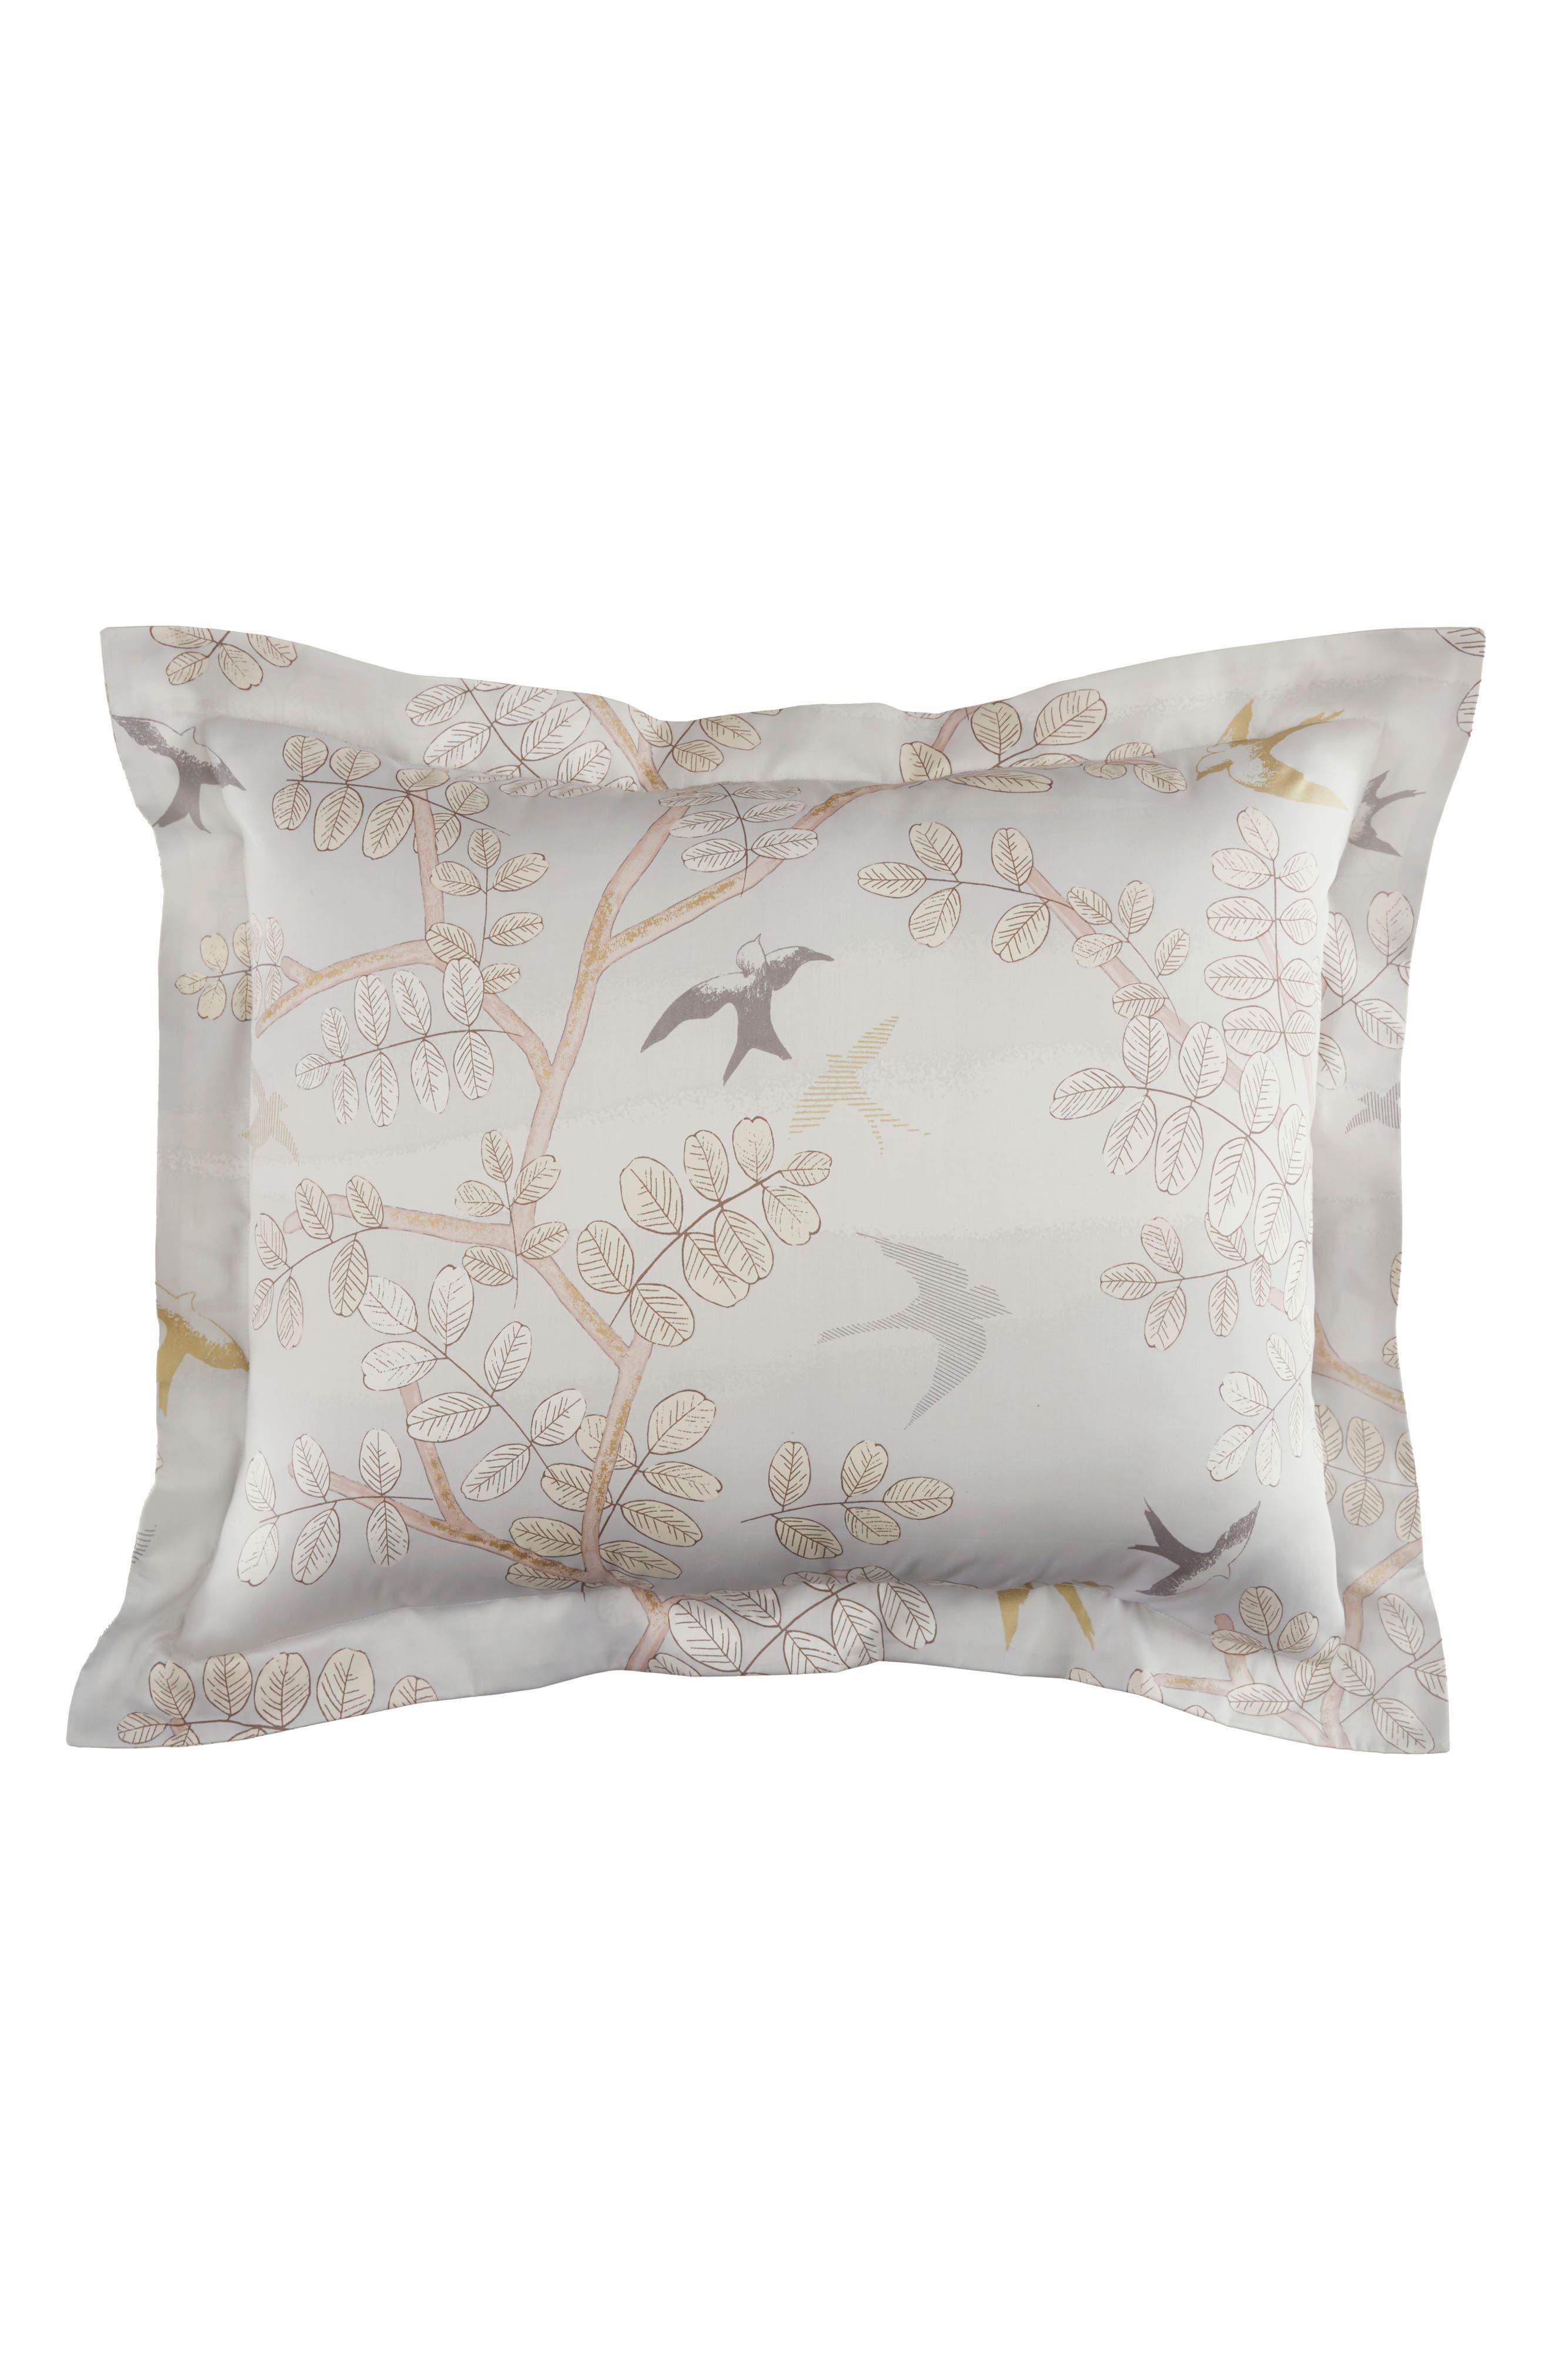 Margot 300 Thread Count Pair of Pillow Shams,                         Main,                         color, Light/ Pastel Grey